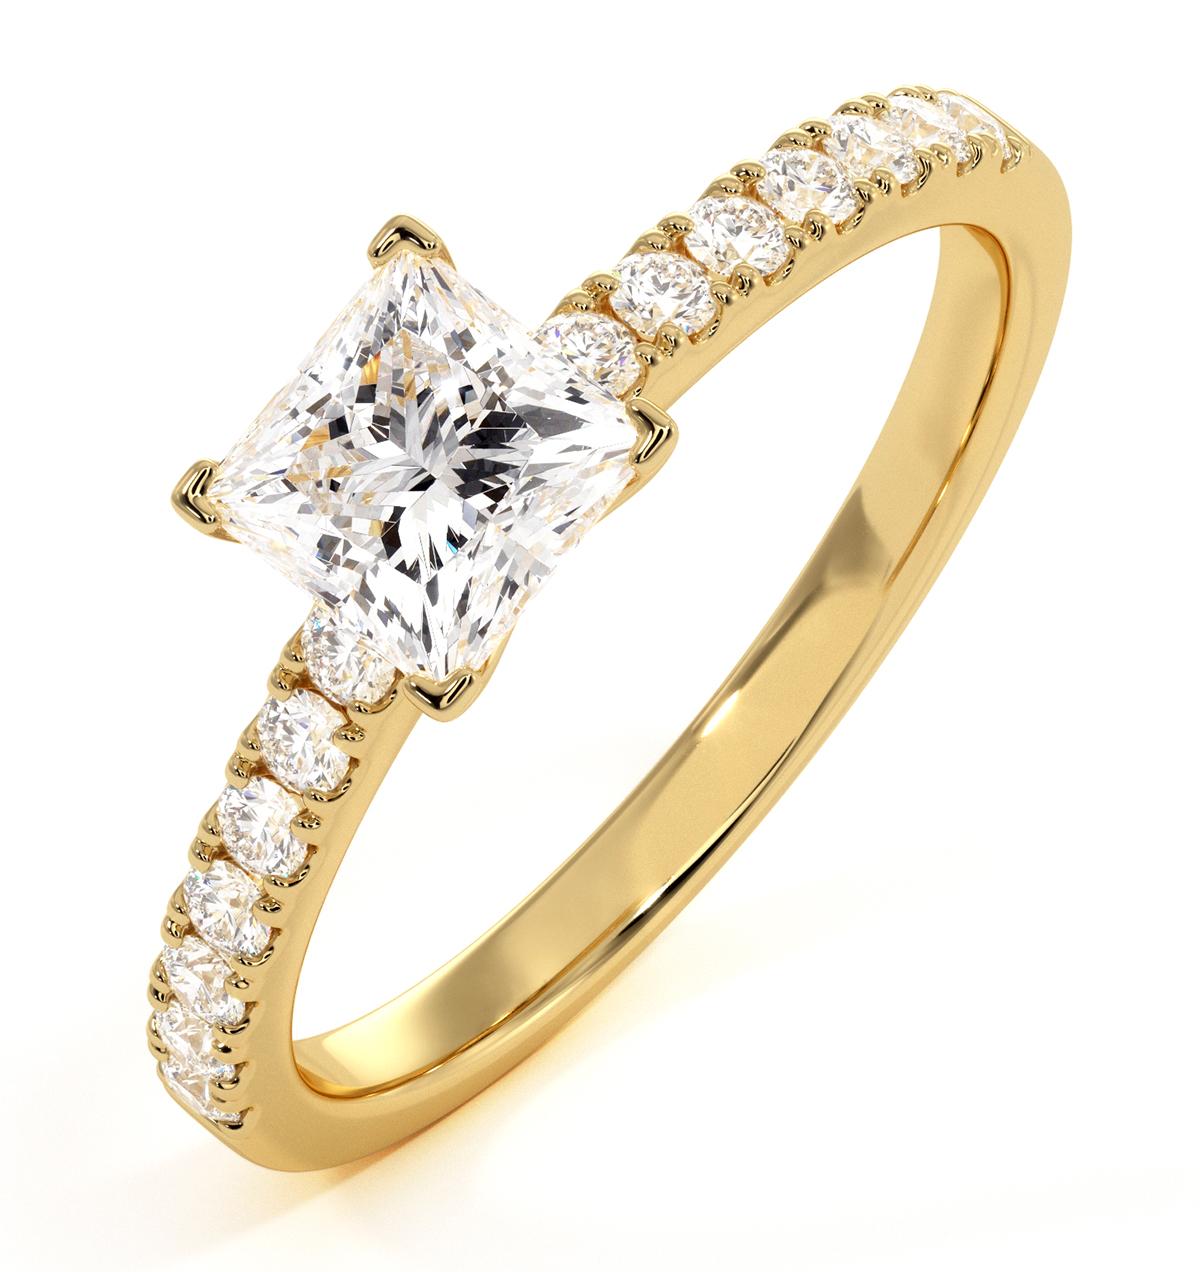 Katerina GIA Princess Diamond Engagement Ring 18K Gold 1.15ct G/SI2 - image 1